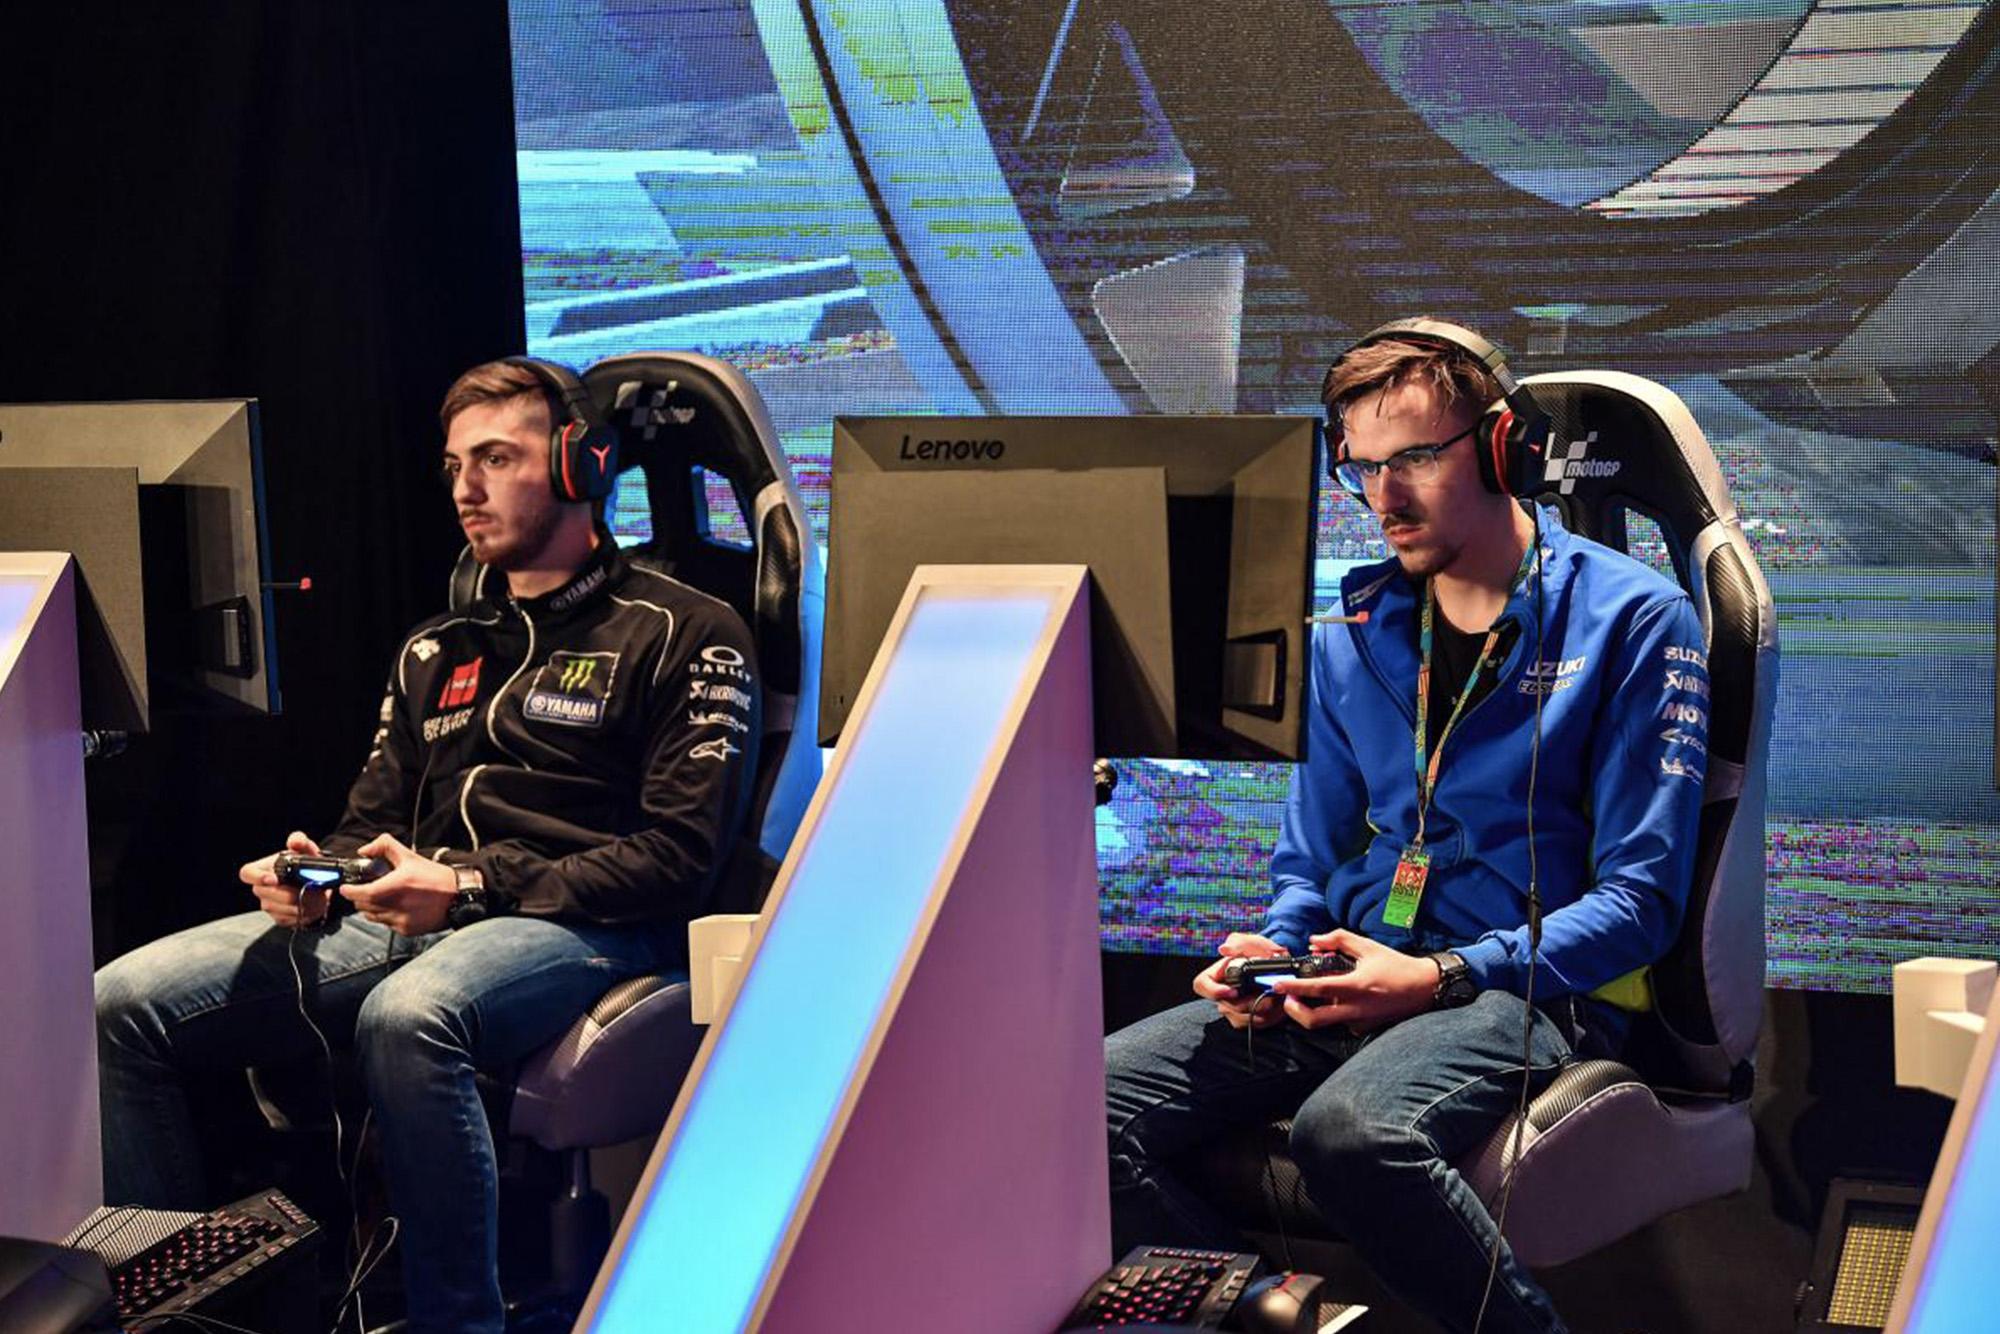 Gamers at MotoGP esports tournament